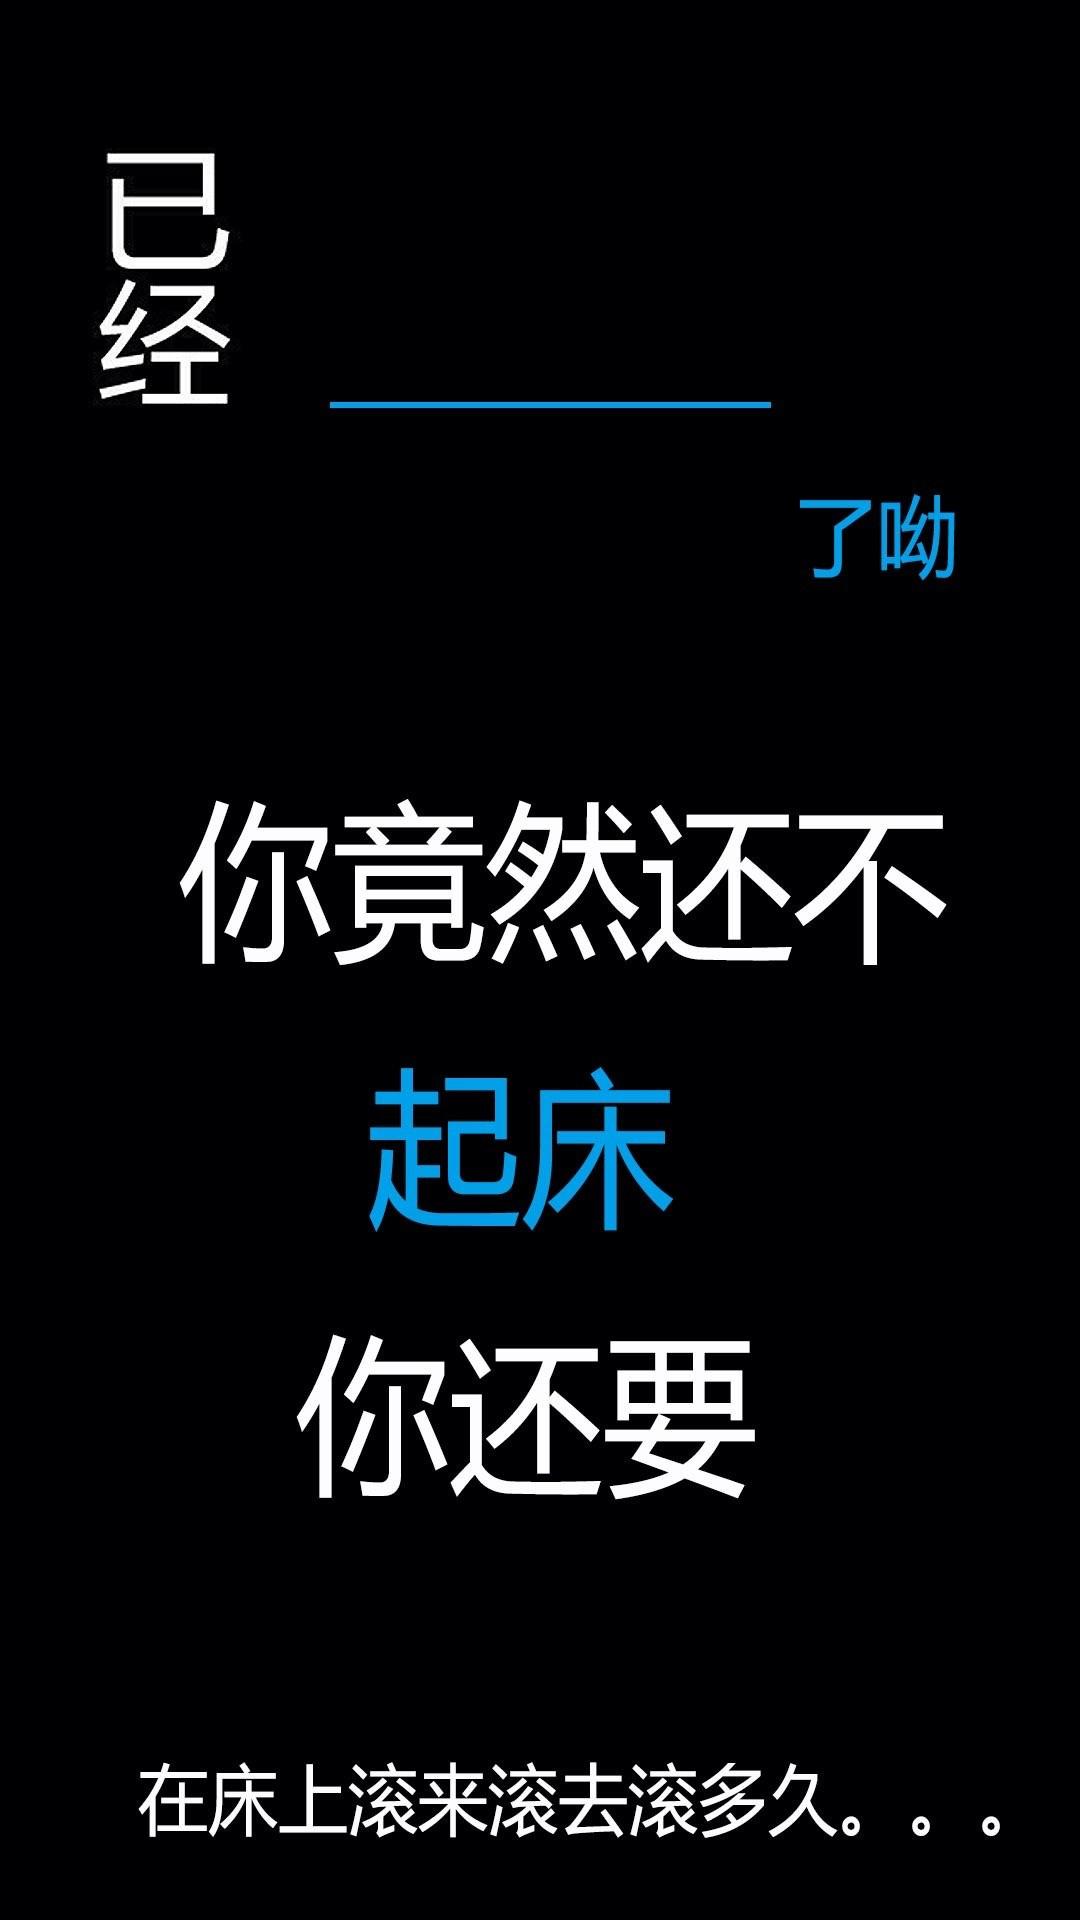 iphone7/6plus壁紙_iphone7/6plus手機壁紙_iphone7/6